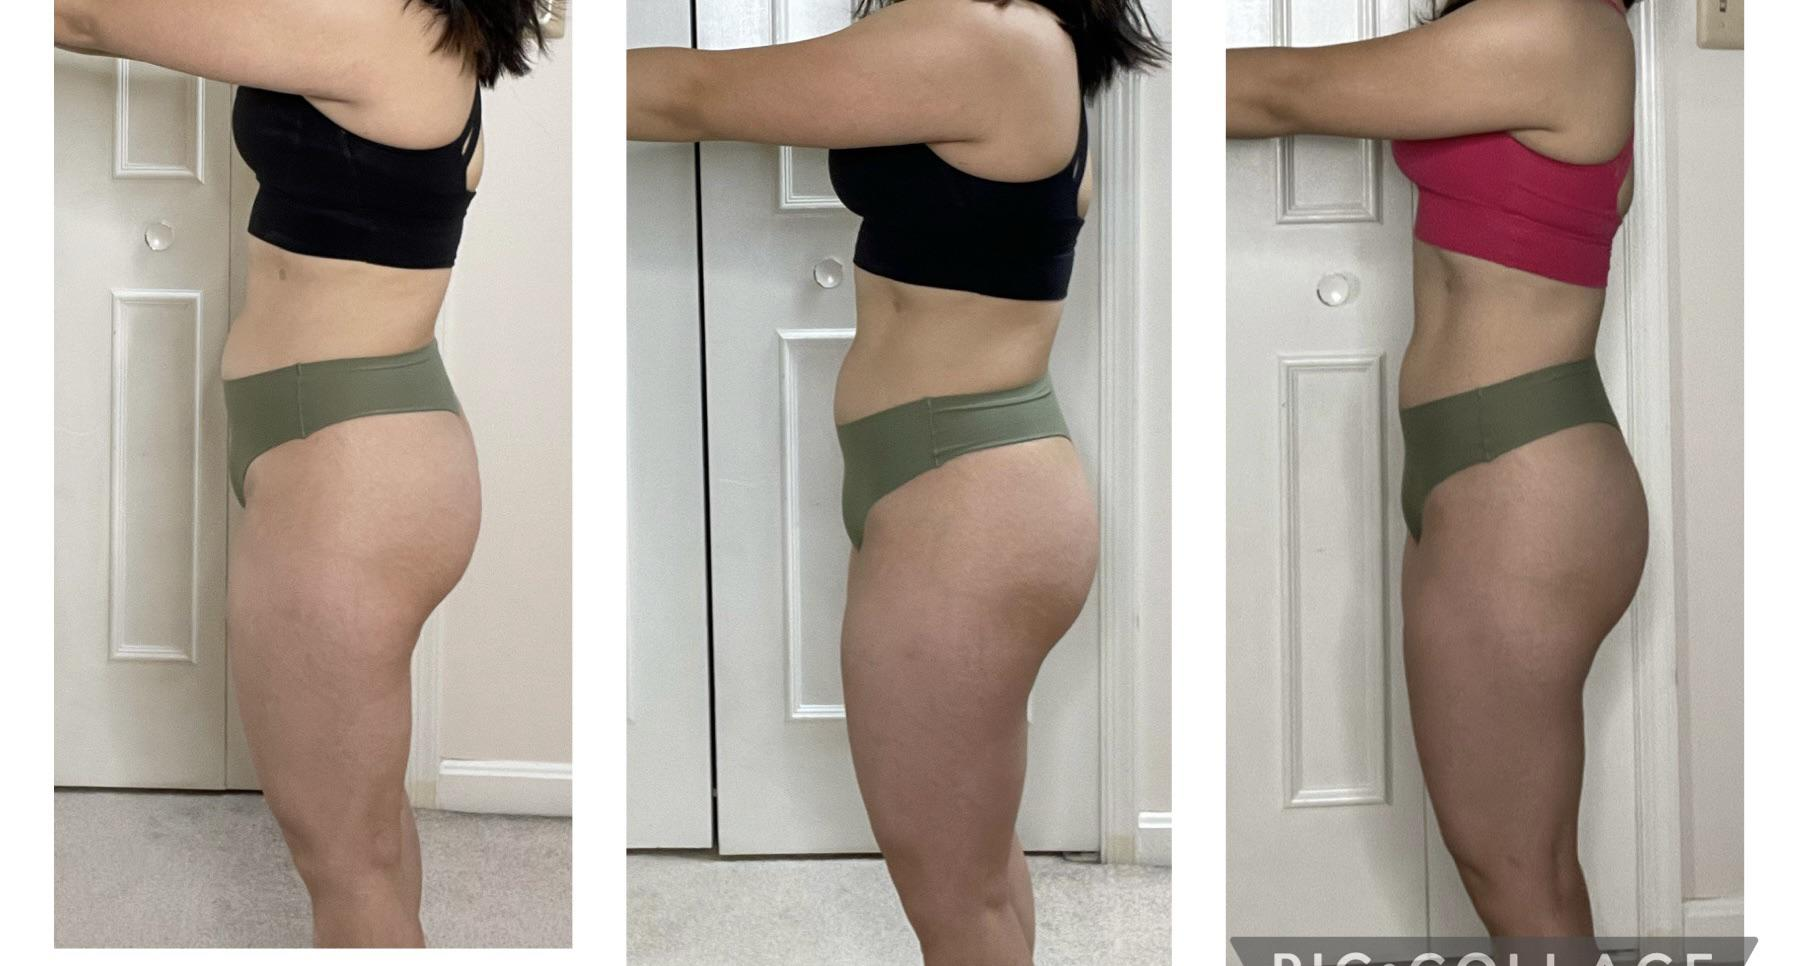 Progress Pics of 11 lbs Weight Loss 5 foot 1 Female 145 lbs to 134 lbs